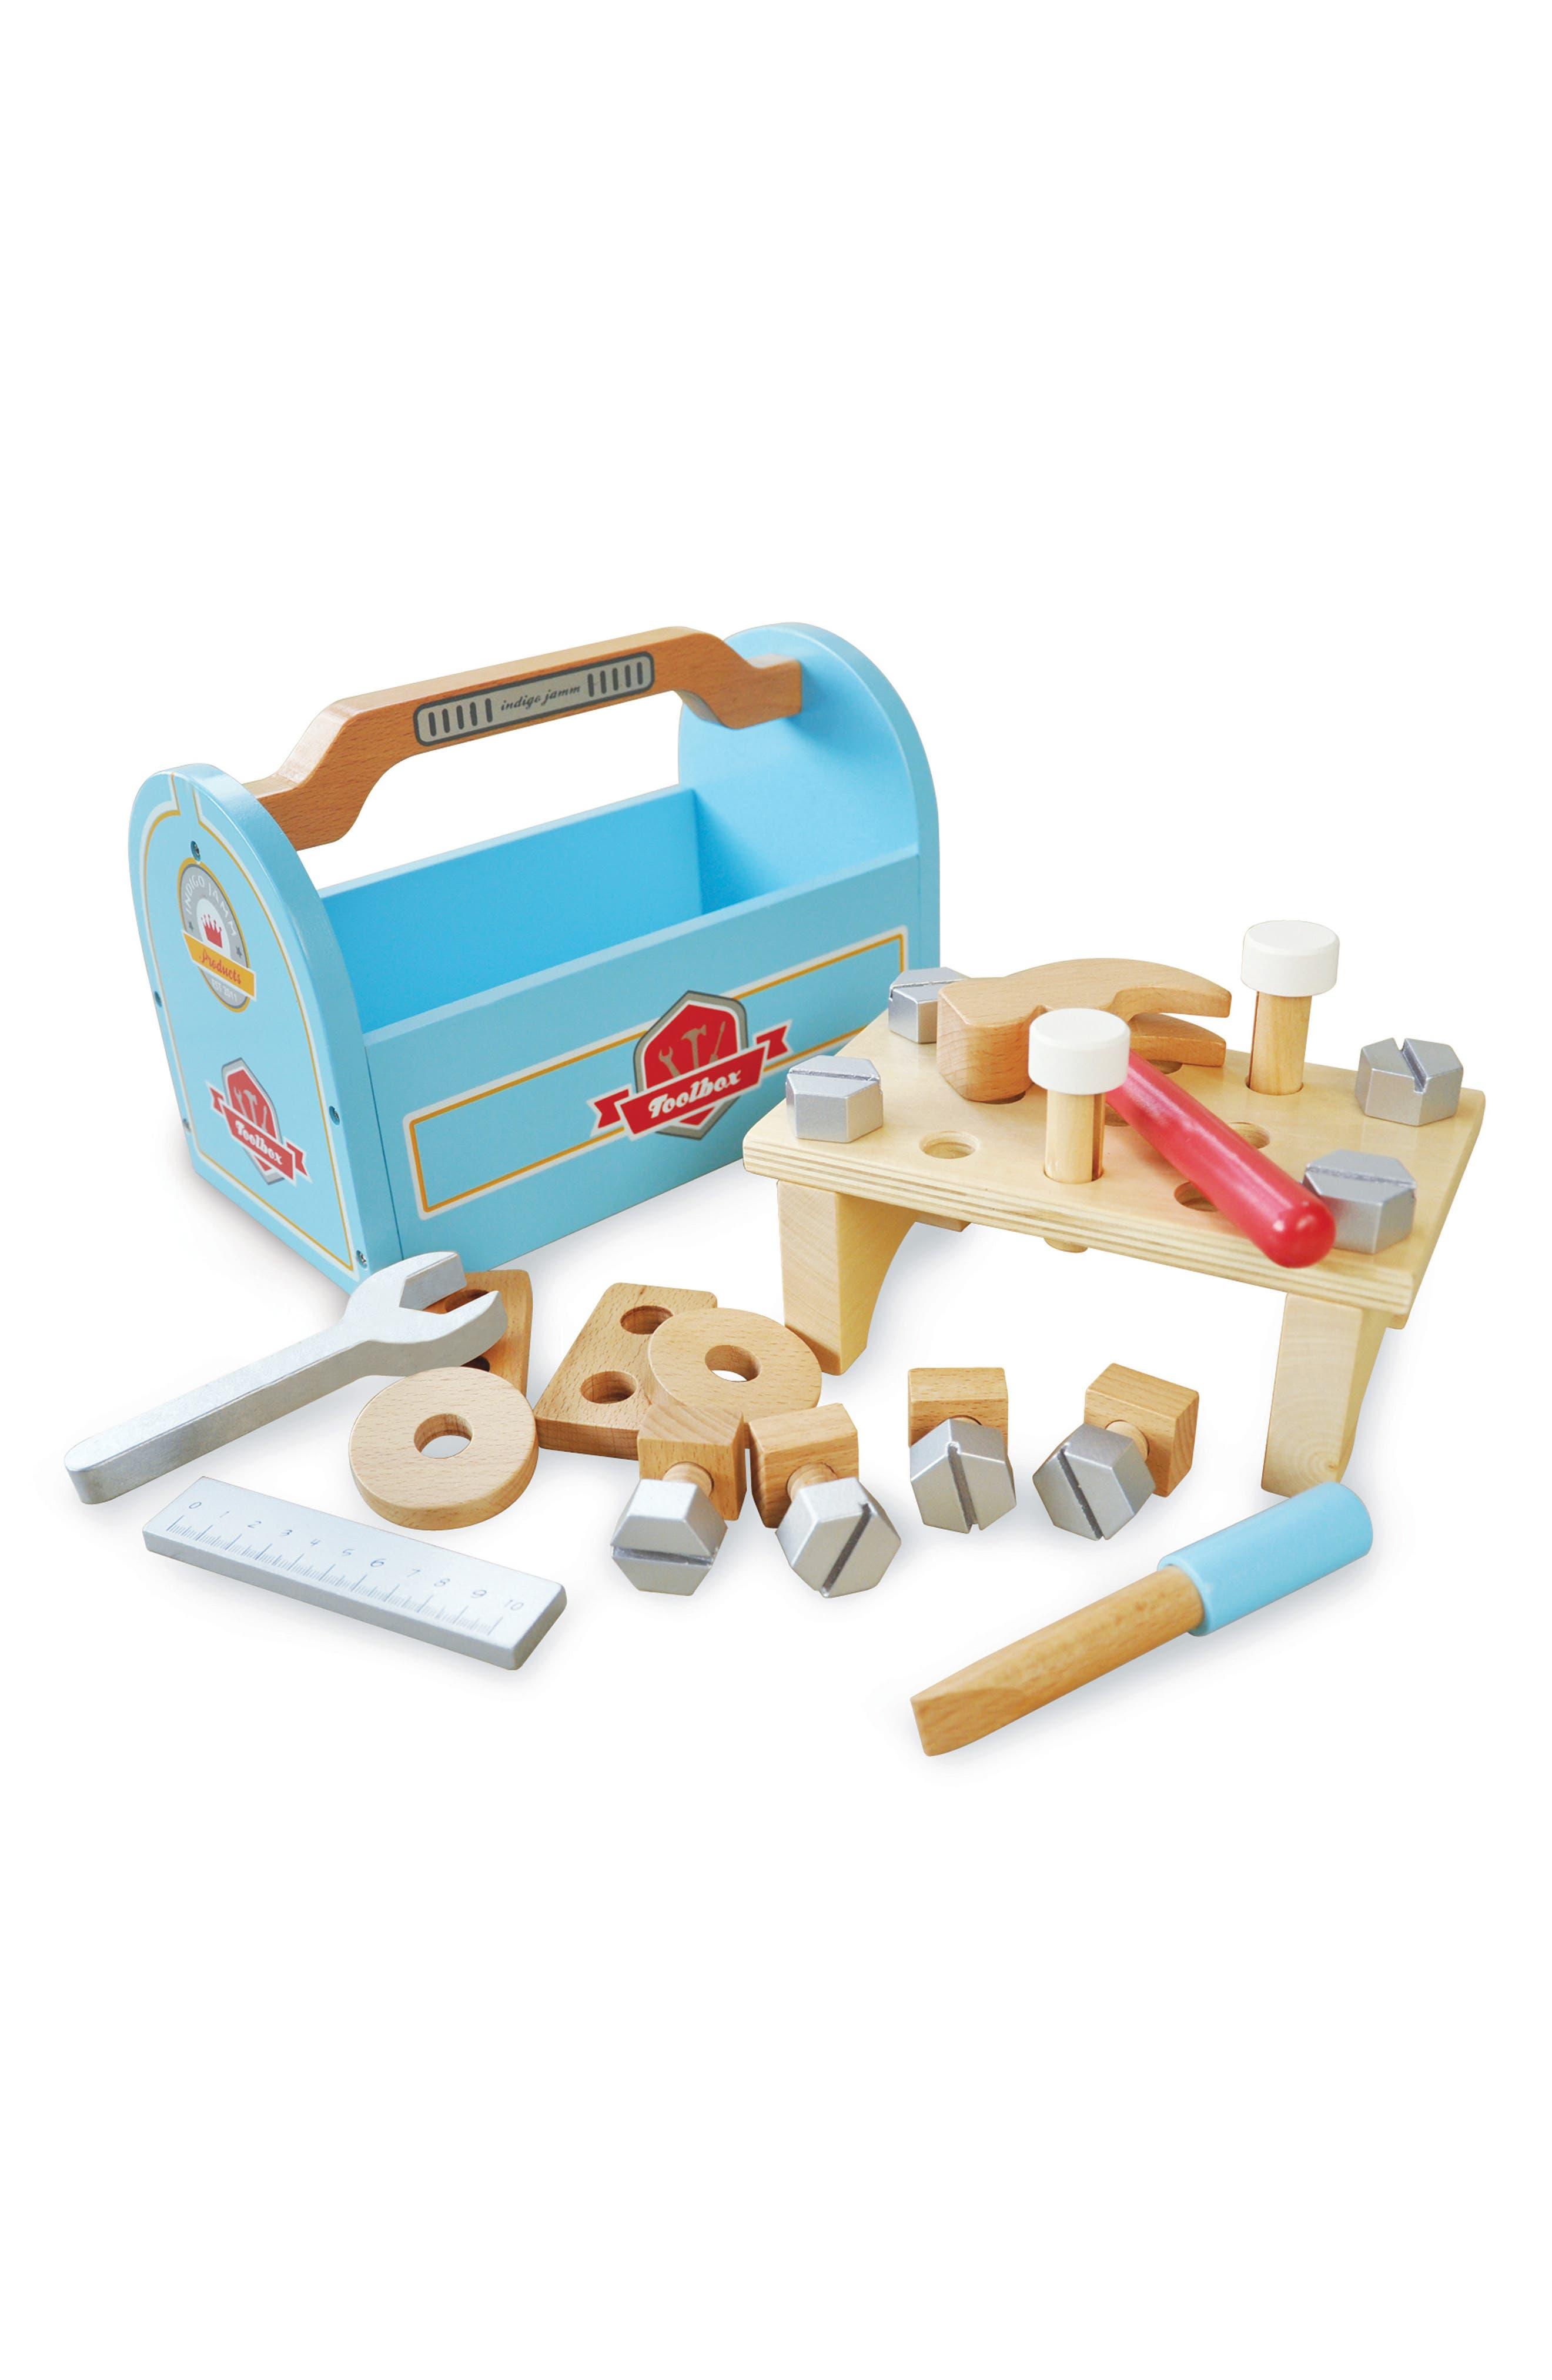 Indigo Jamm Little Carpenters Toolbox